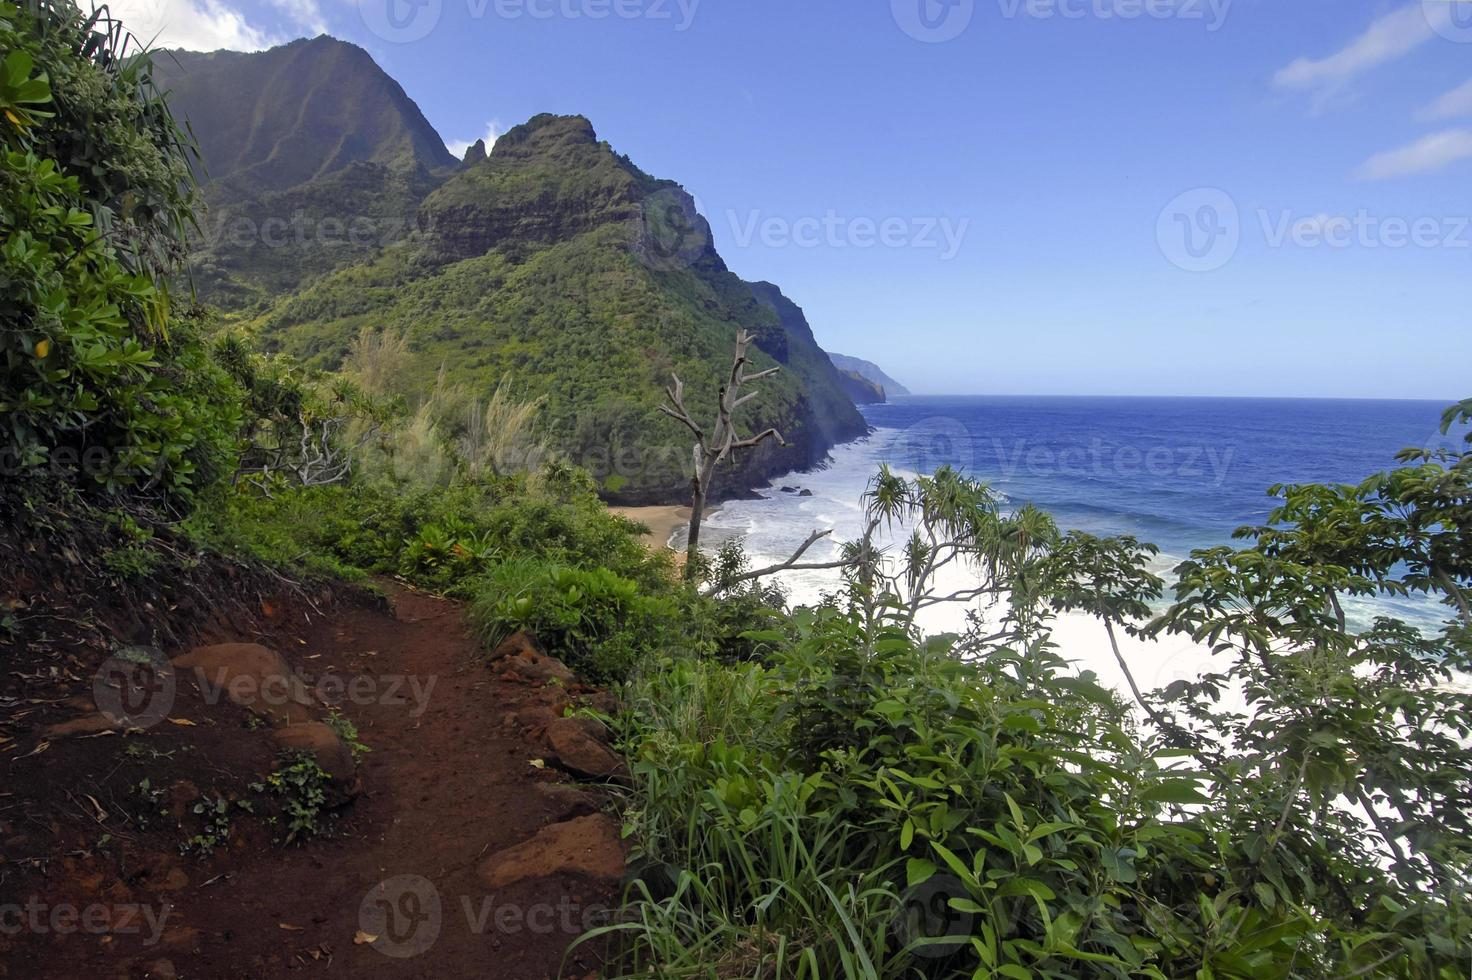 robust kust och klippor i Kauai, Hawaii foto